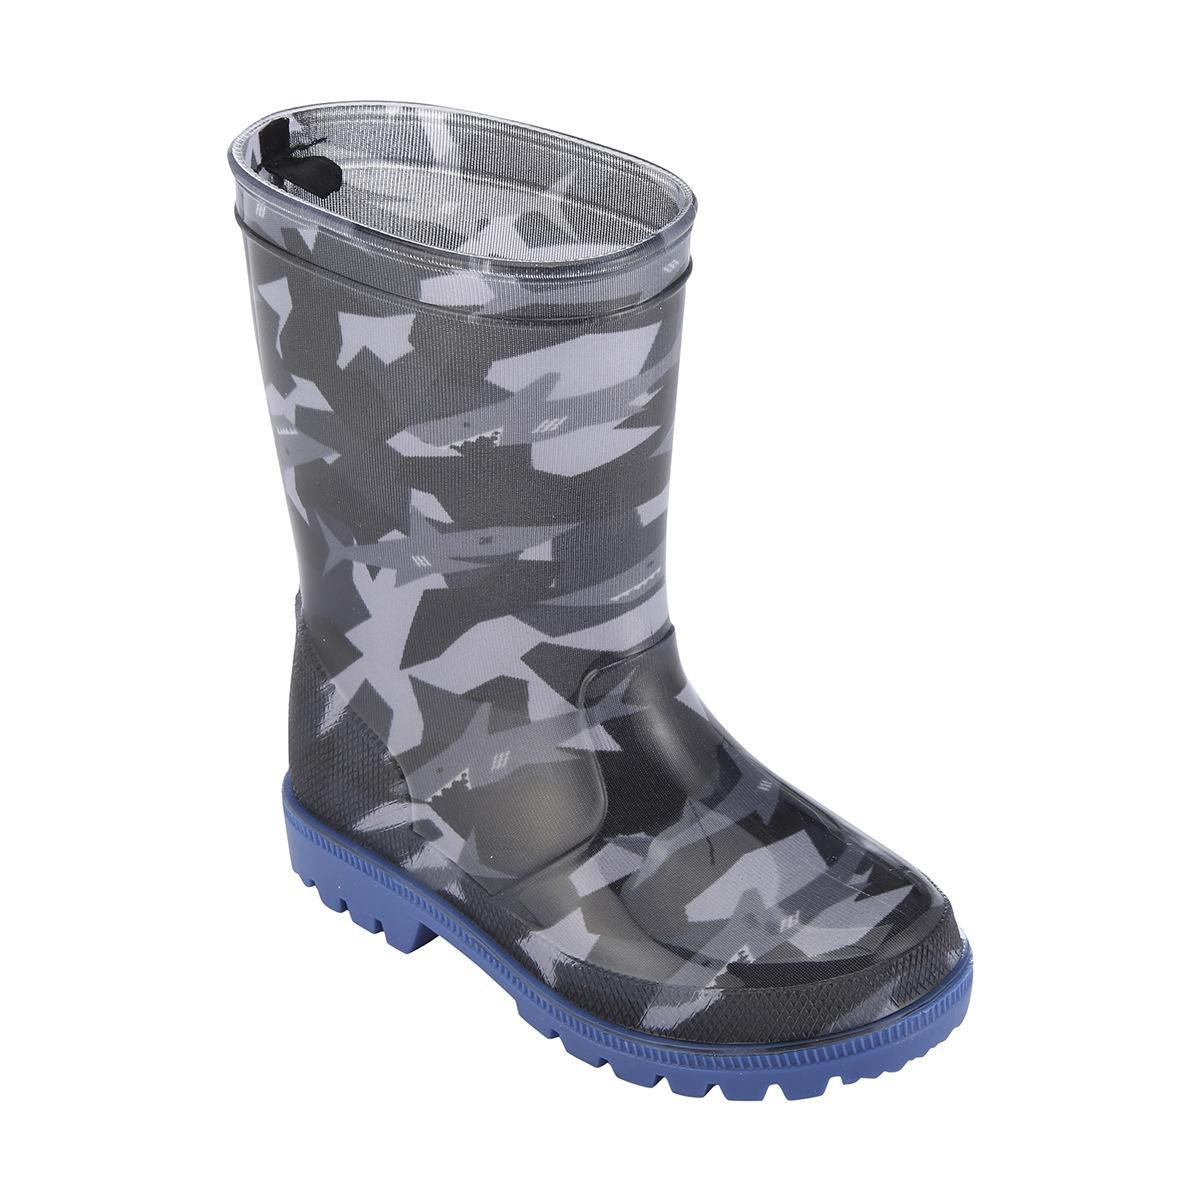 printed rain boots kmart. Black Bedroom Furniture Sets. Home Design Ideas